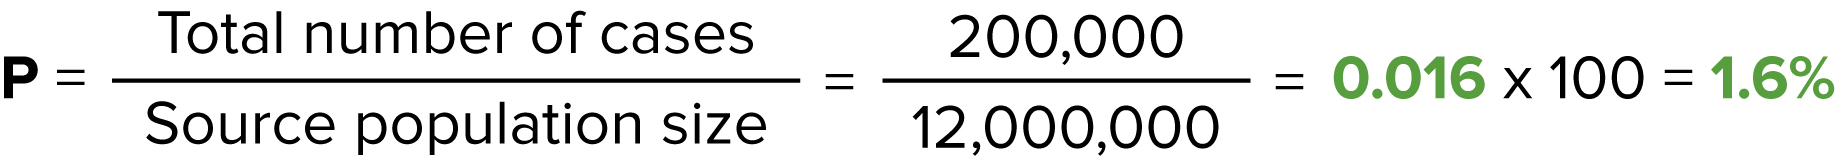 prevalence formula example